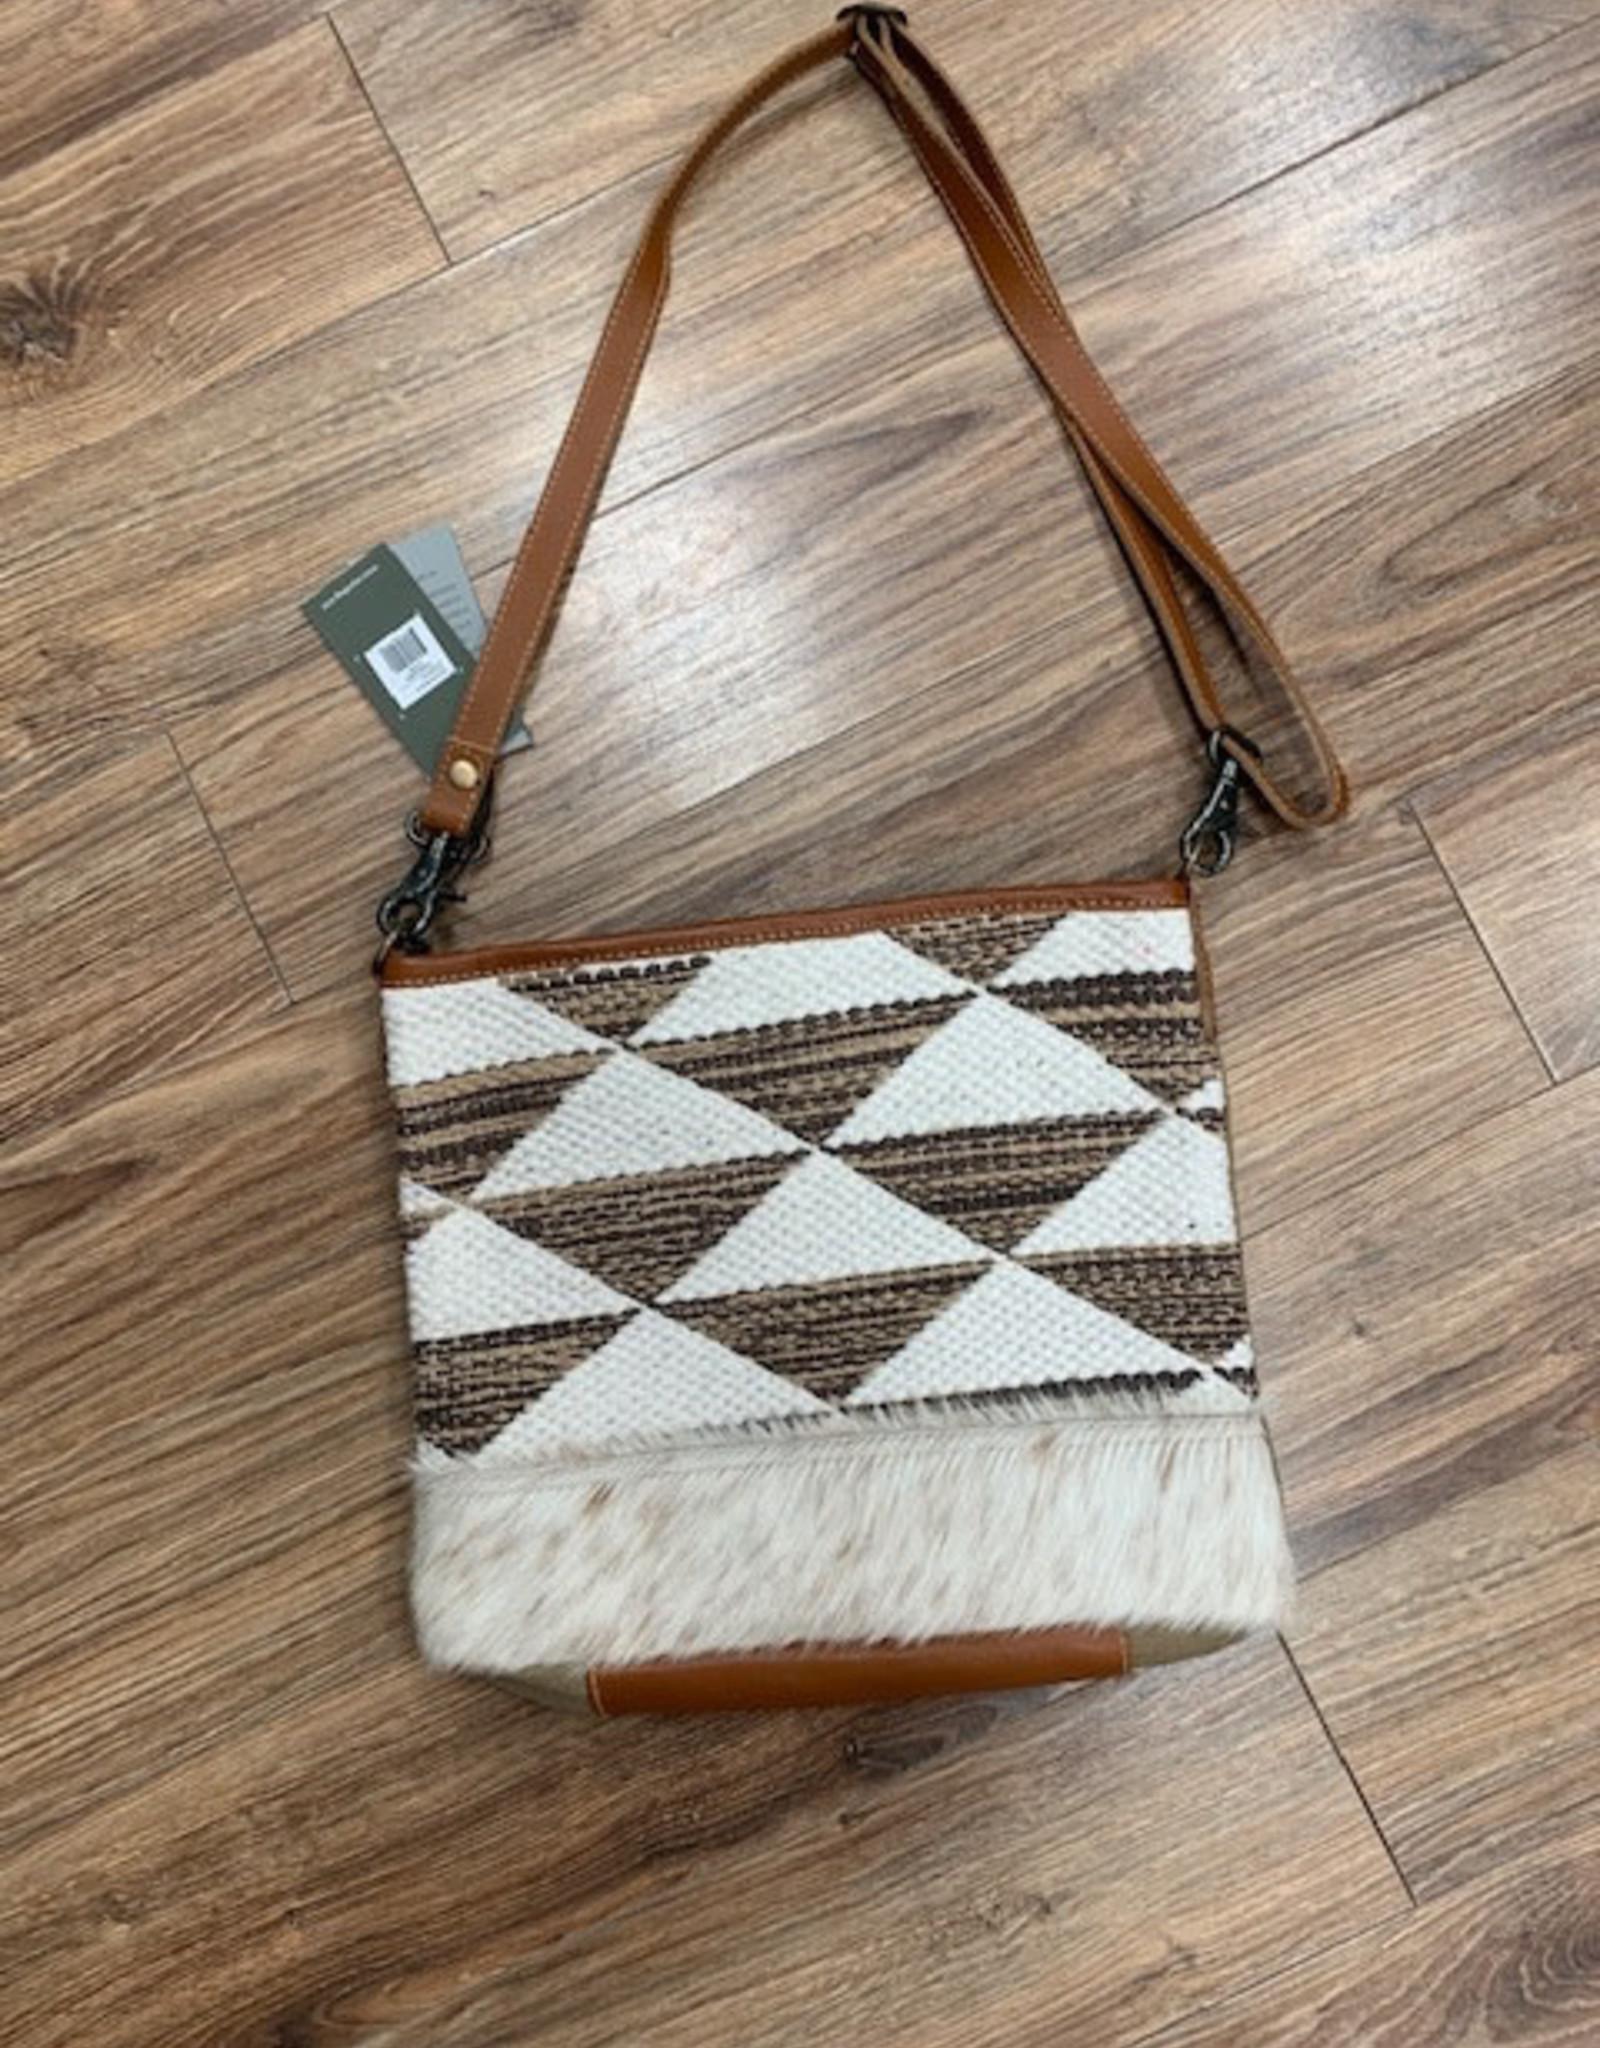 Bag Prismatic Bag